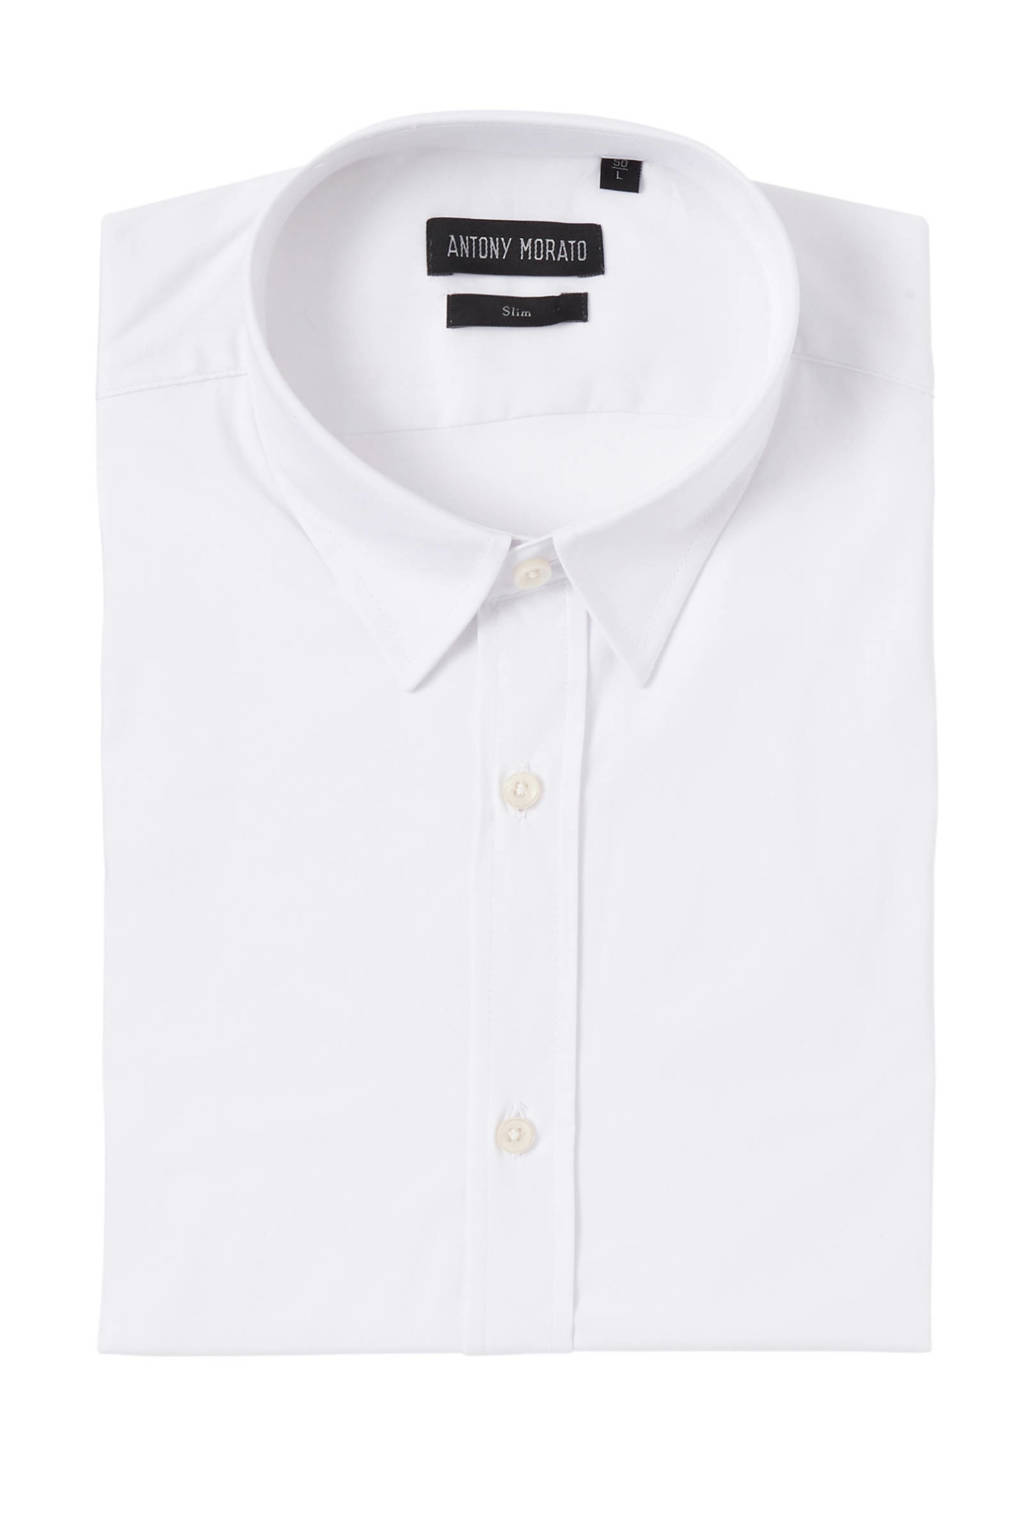 Antony Morato slim fit overhemd, Wit